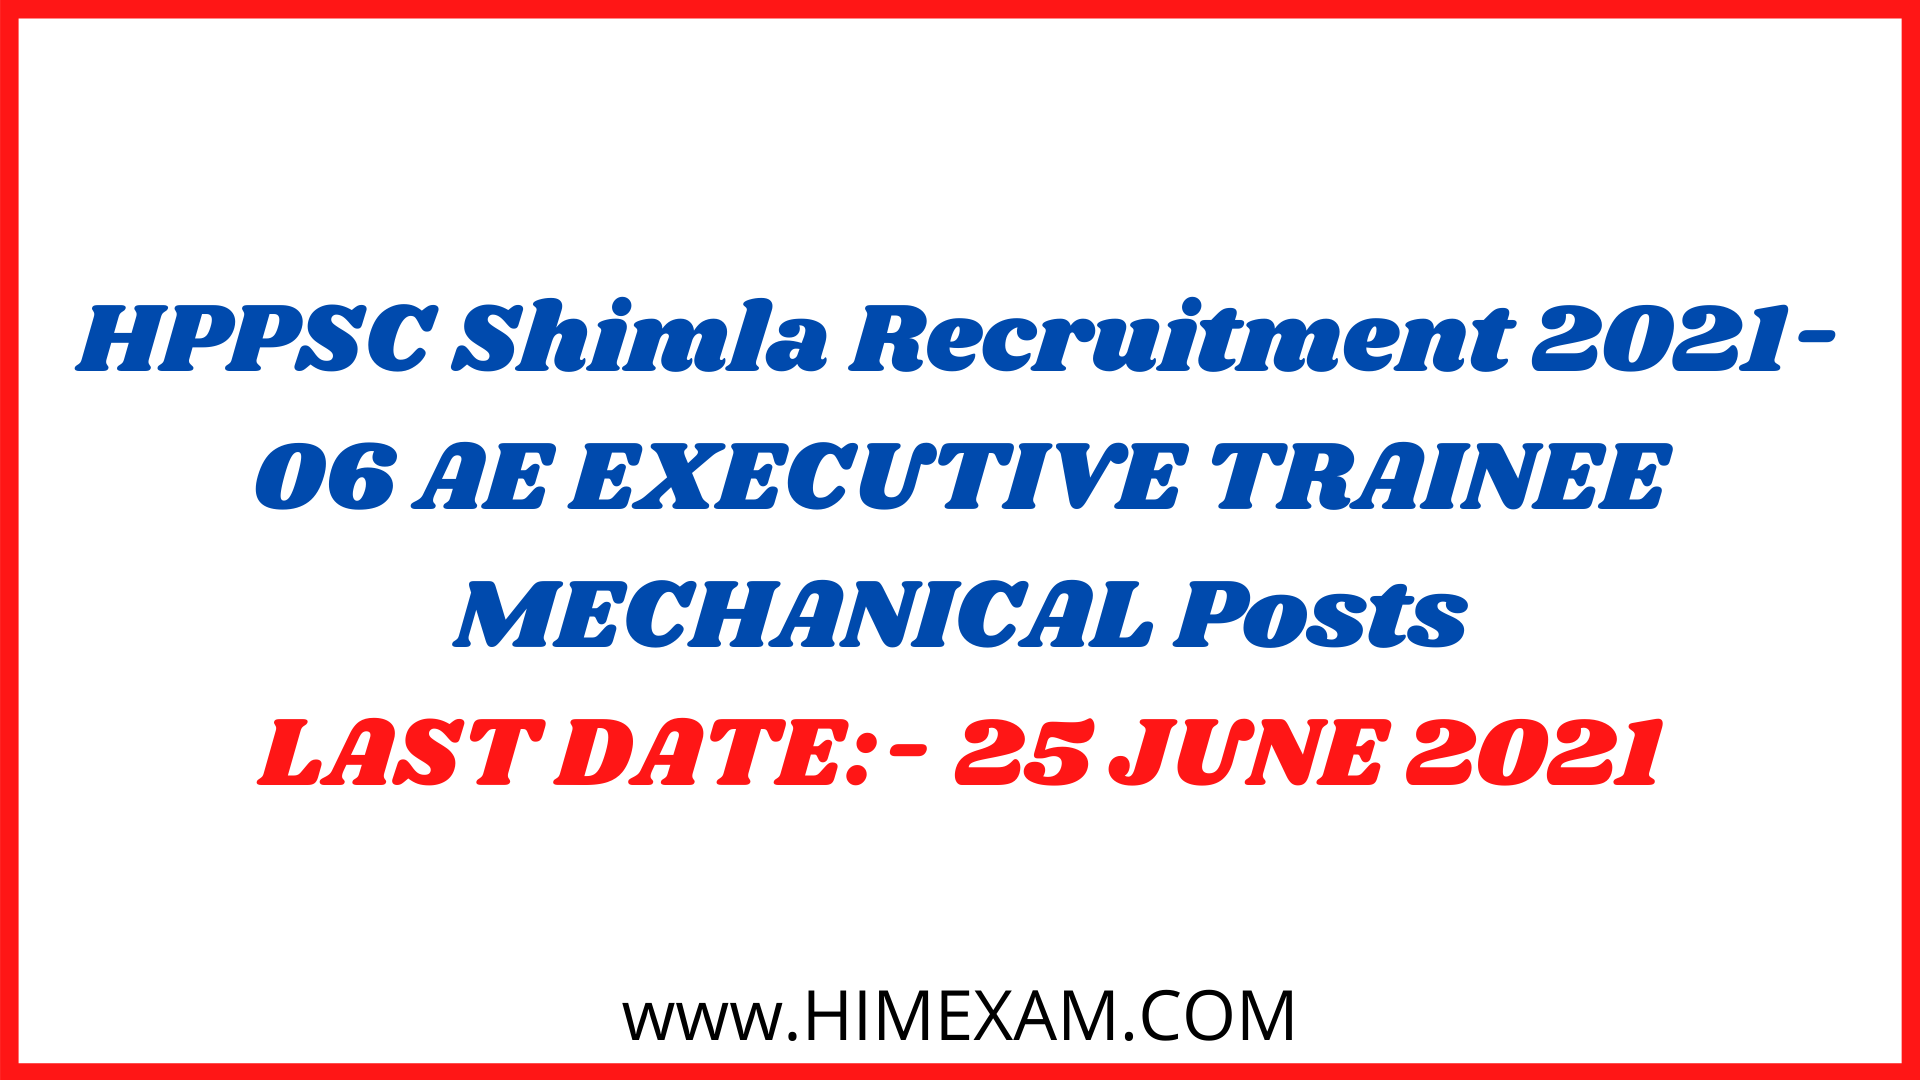 HPPSC Shimla Recruitment 2021-06 AE EXECUTIVE TRAINEE MECHANICAL Posts